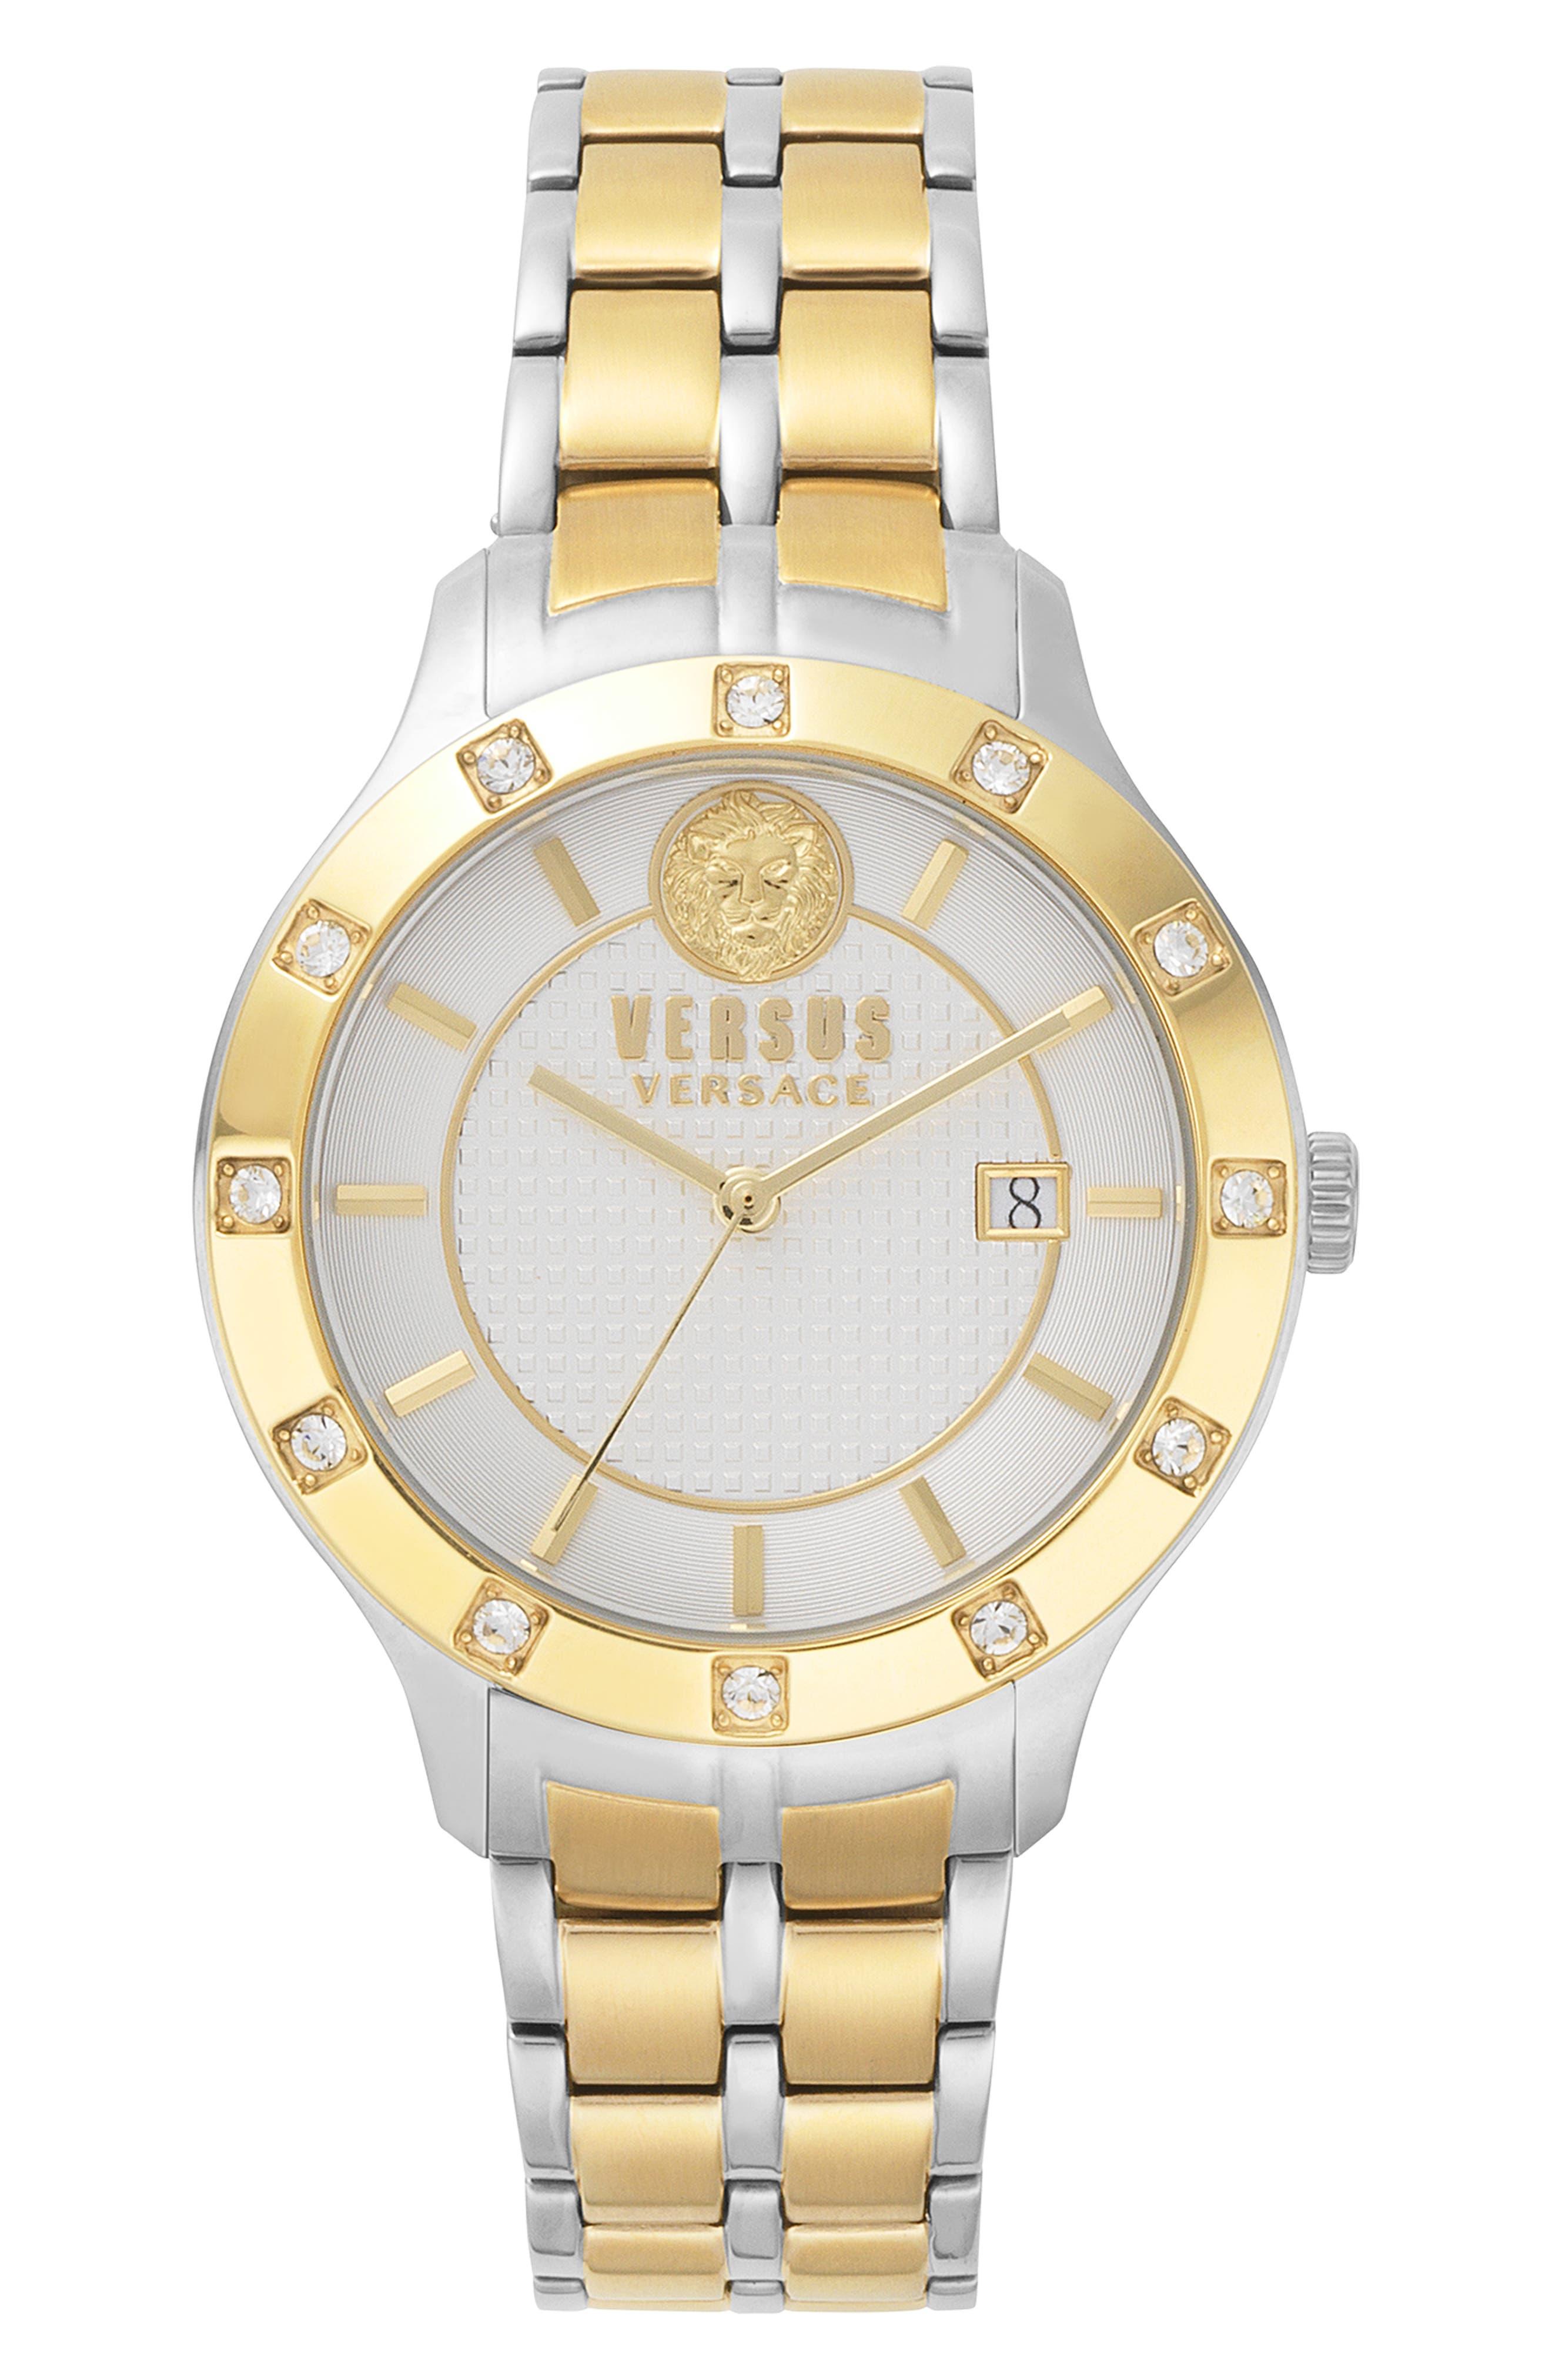 VERSUS VERSACE, Brackenfell Swarovski Bracelet Watch, 38mm, Main thumbnail 1, color, GOLD/ SILVER